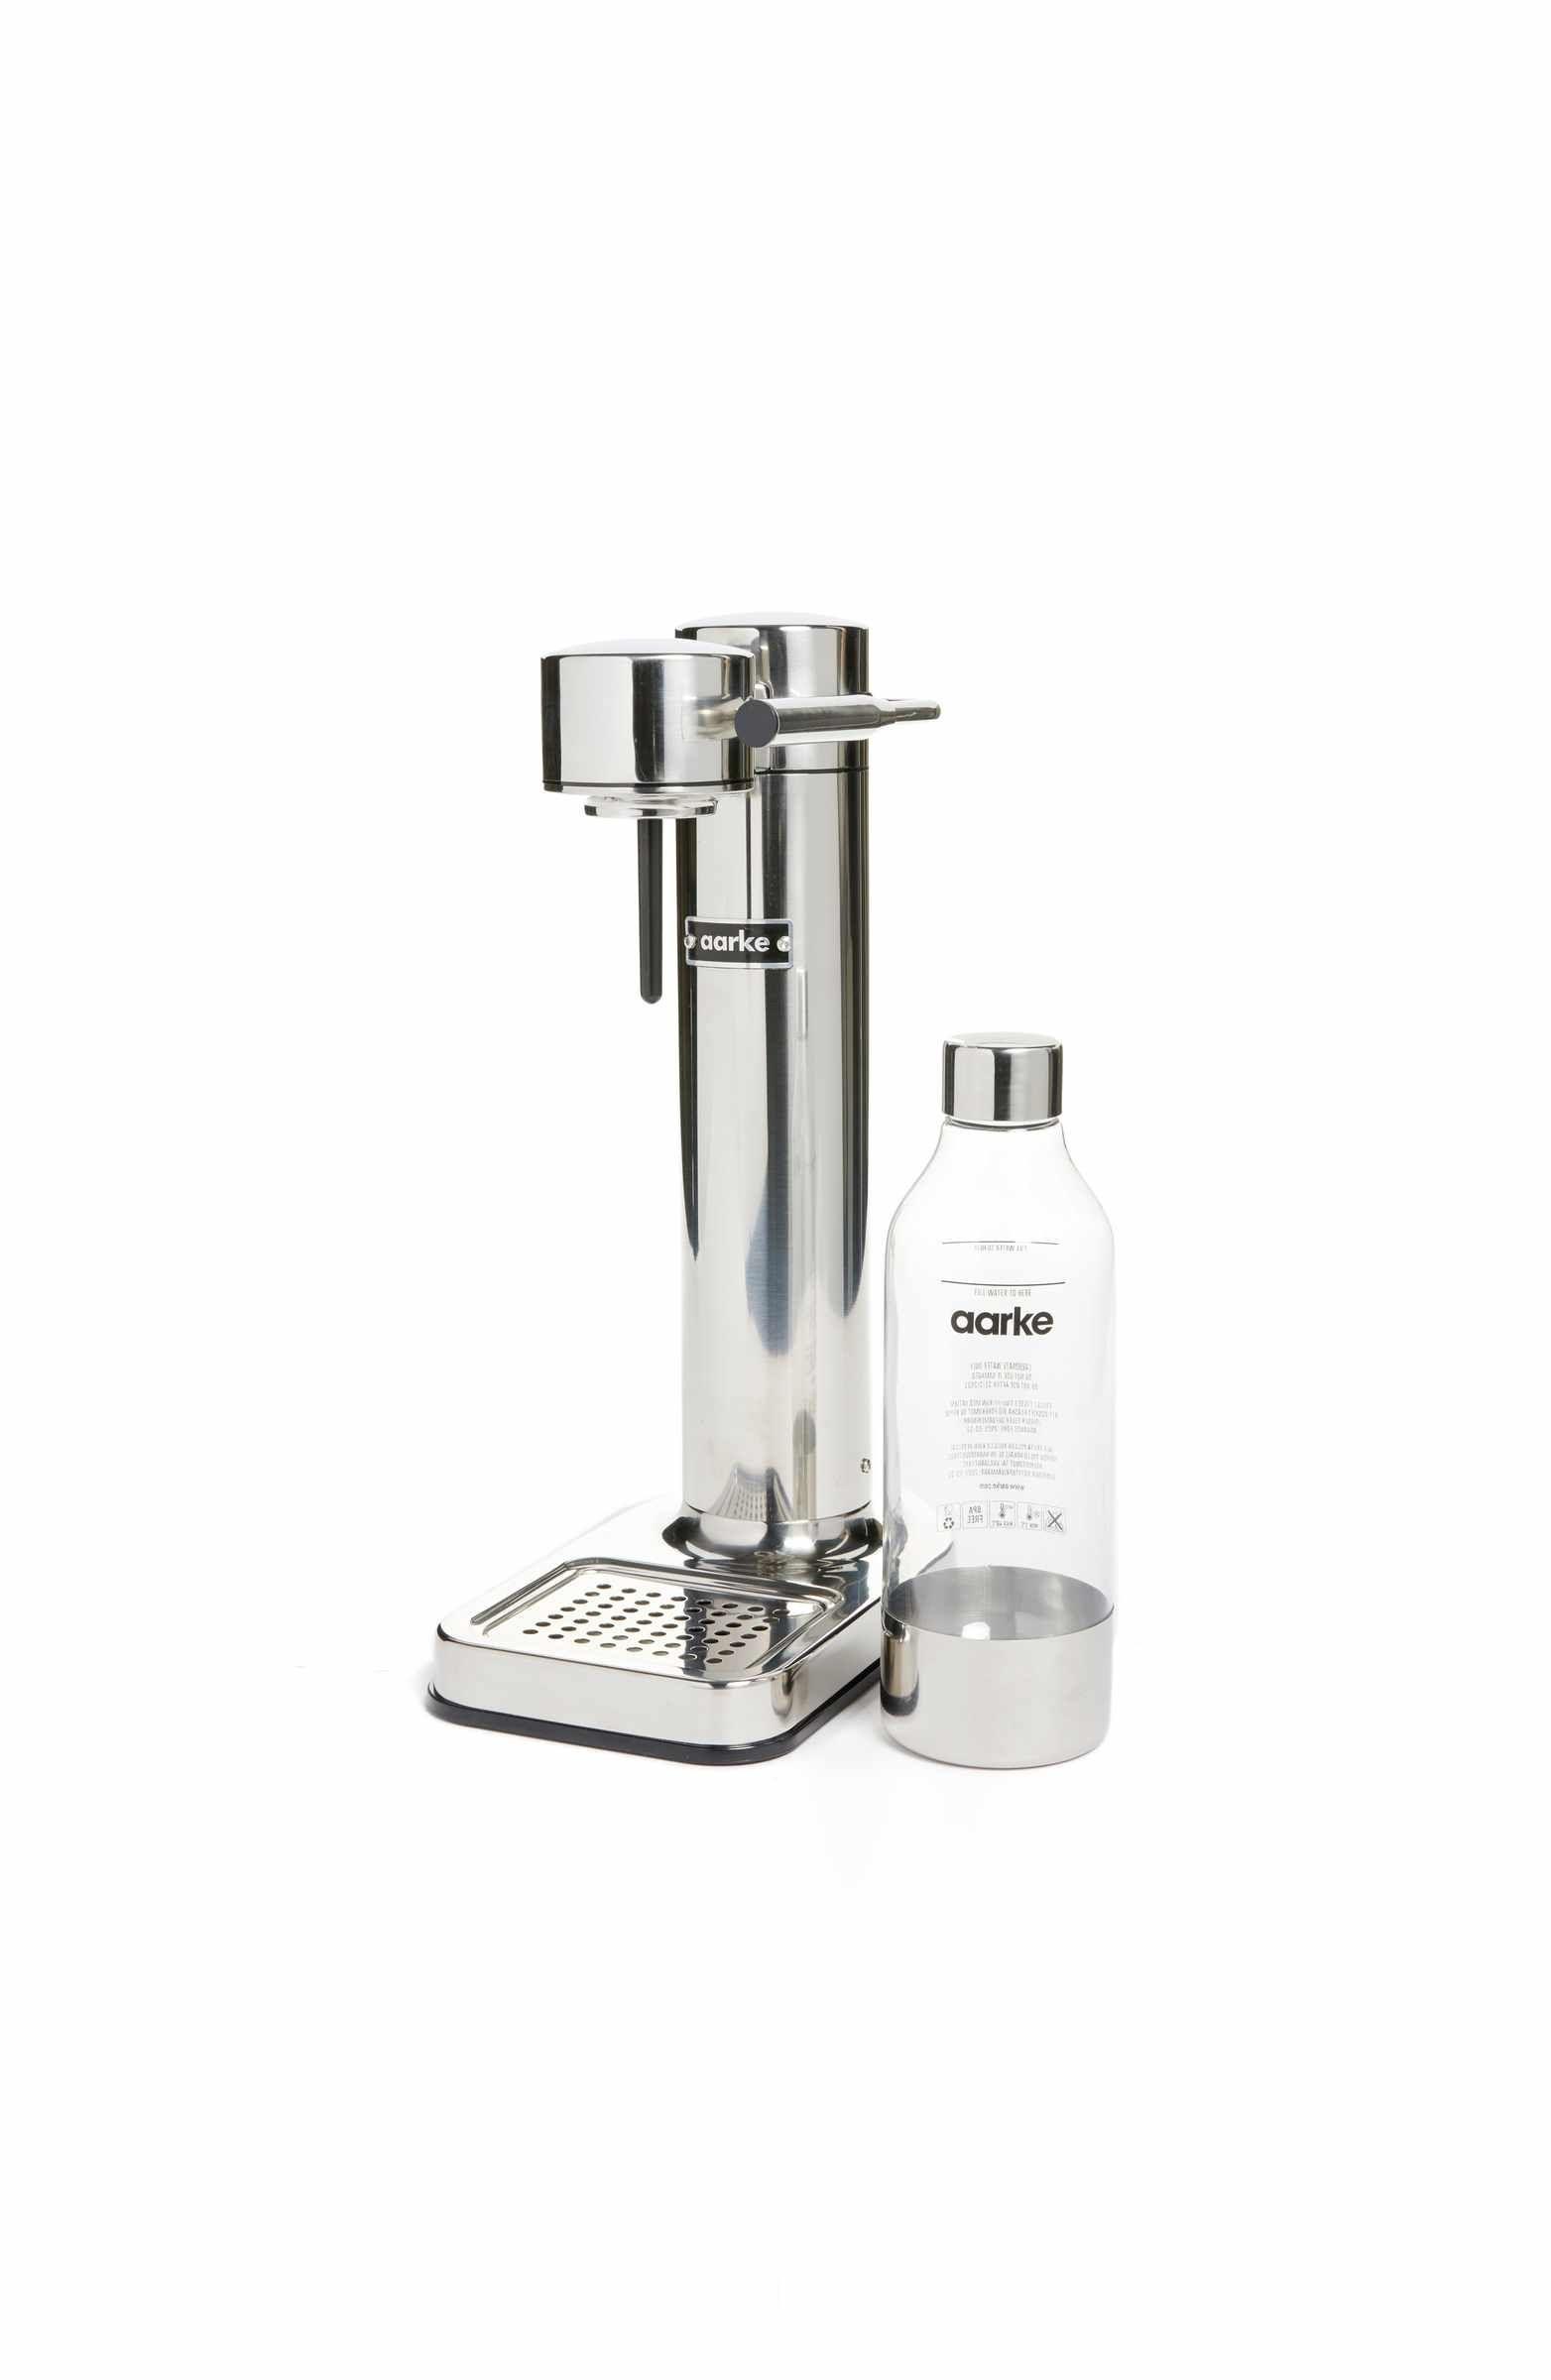 Aarke stainless steel sparkling water maker sparkling